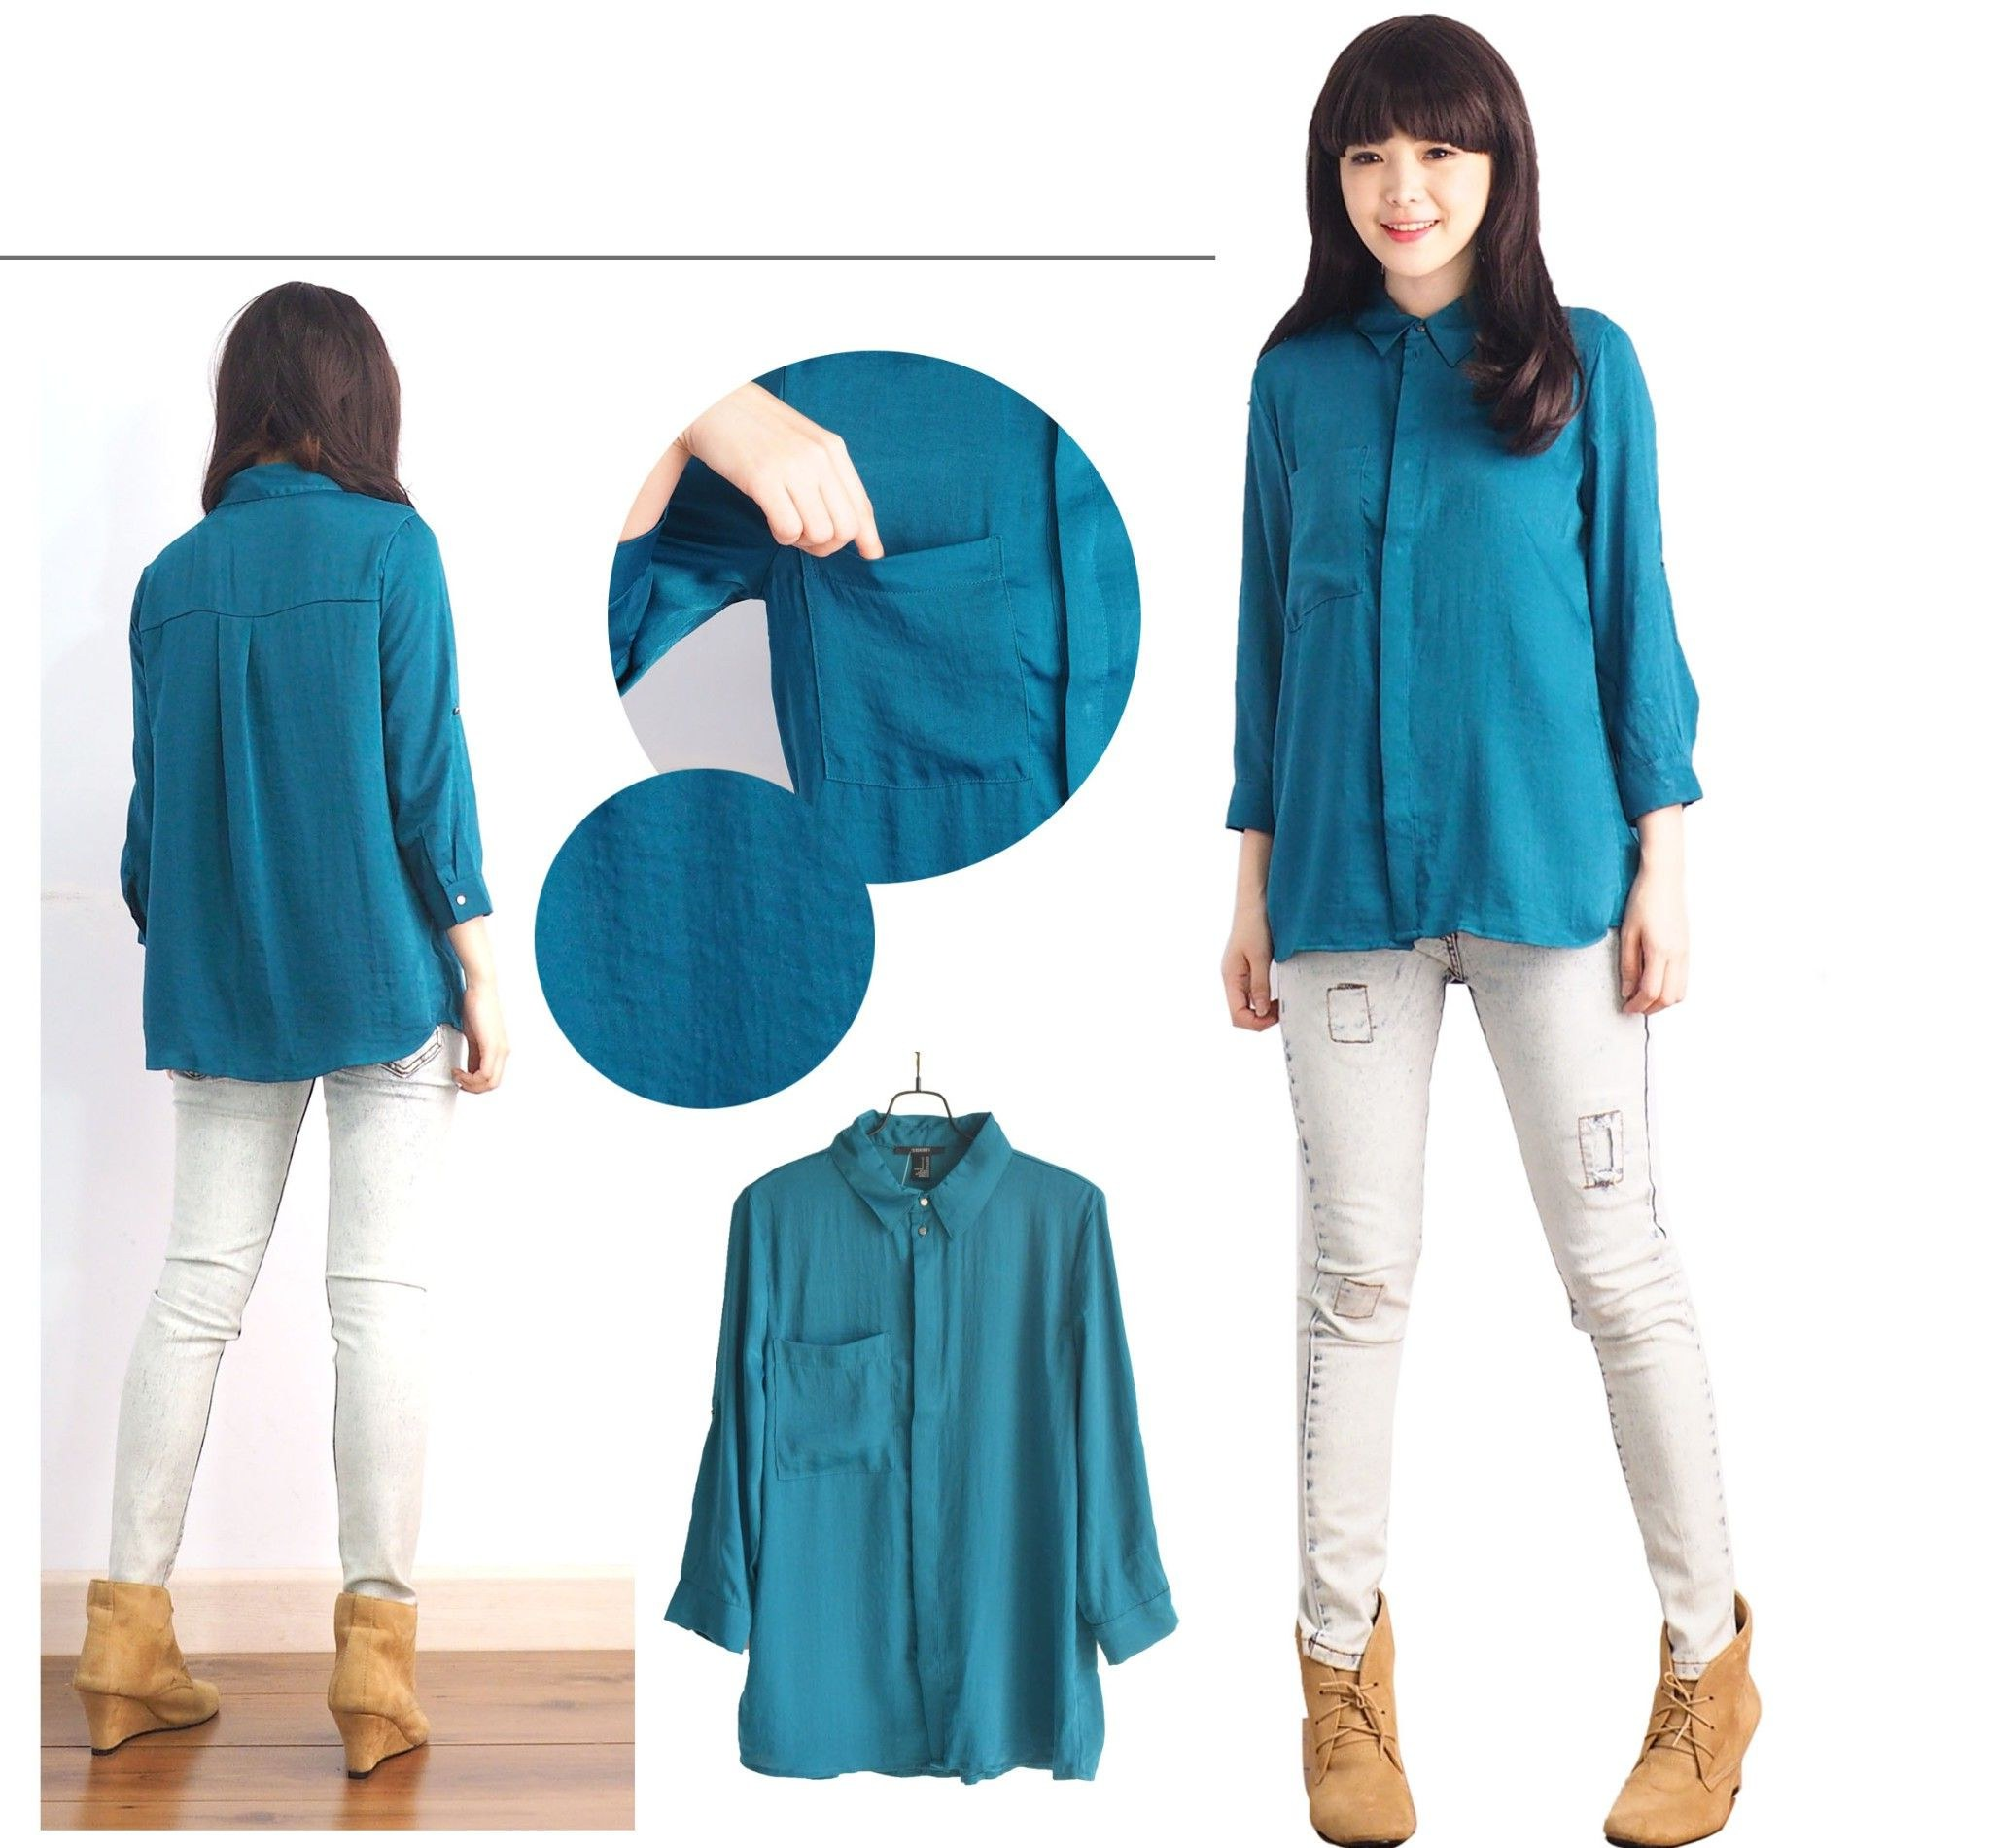 Design Model Baju Lebaran Terkini Zwd9 Blouse Muslim Model Pakaian Wanita Terbaru Pakaian Bayi